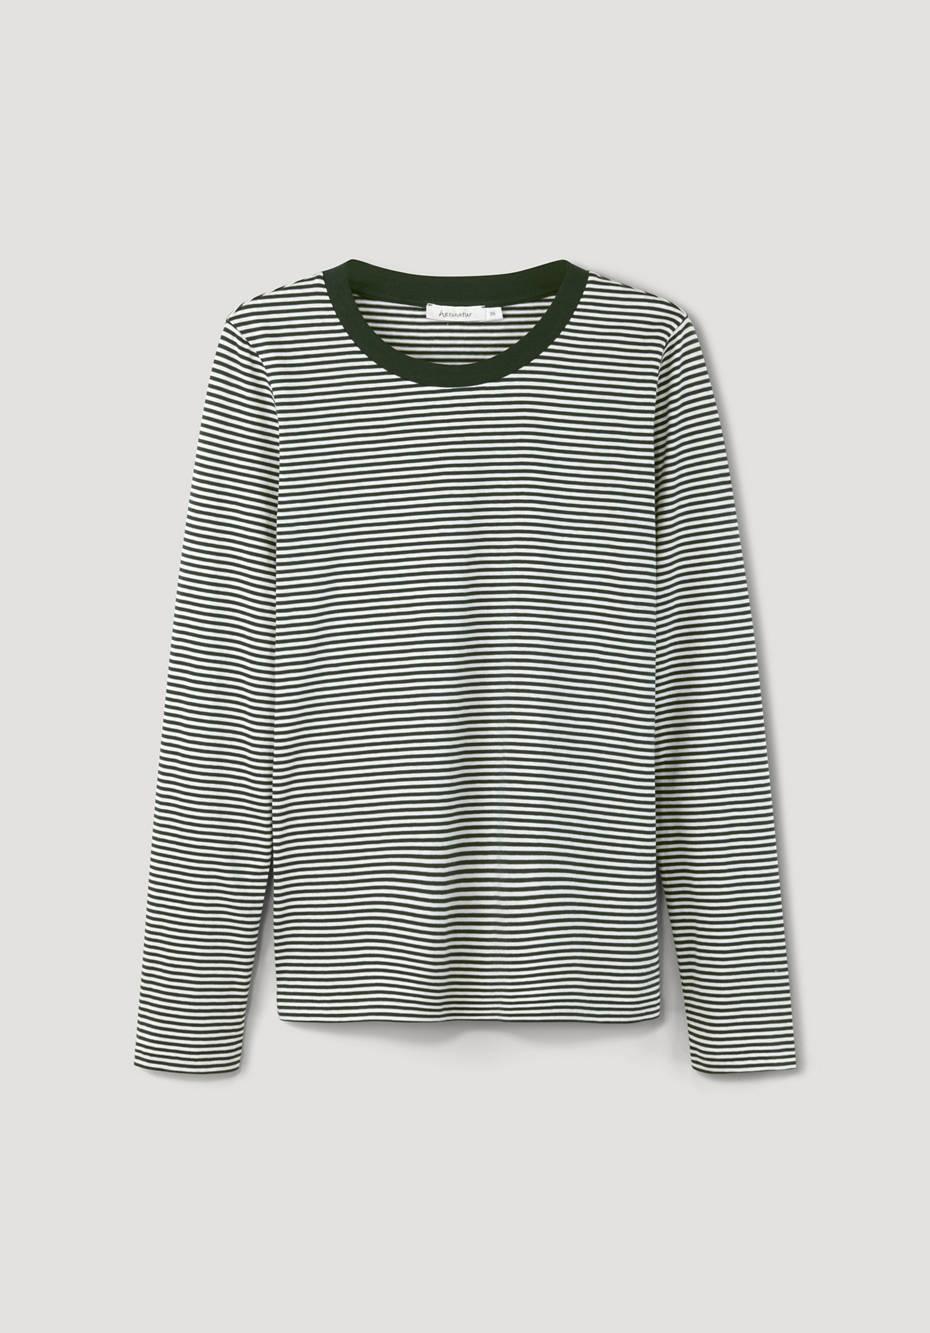 Striped shirt made of pure organic cotton